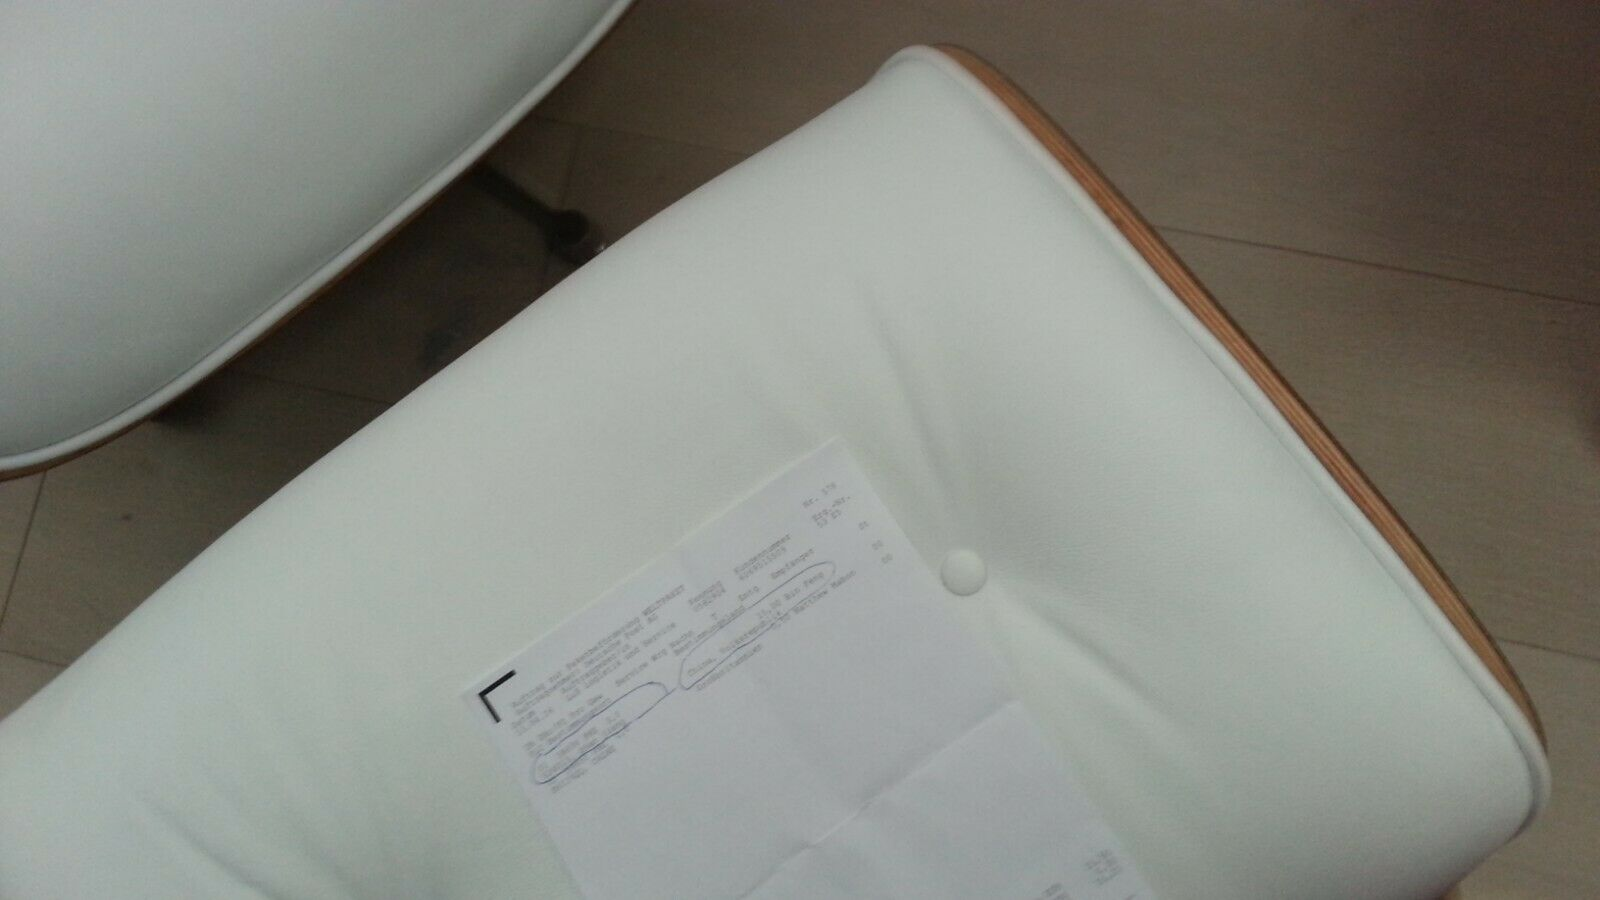 1 18 NOREV 183465 MERCEDES BENZ 560 SEL w126 darkblu Limited Edition 1000 PC